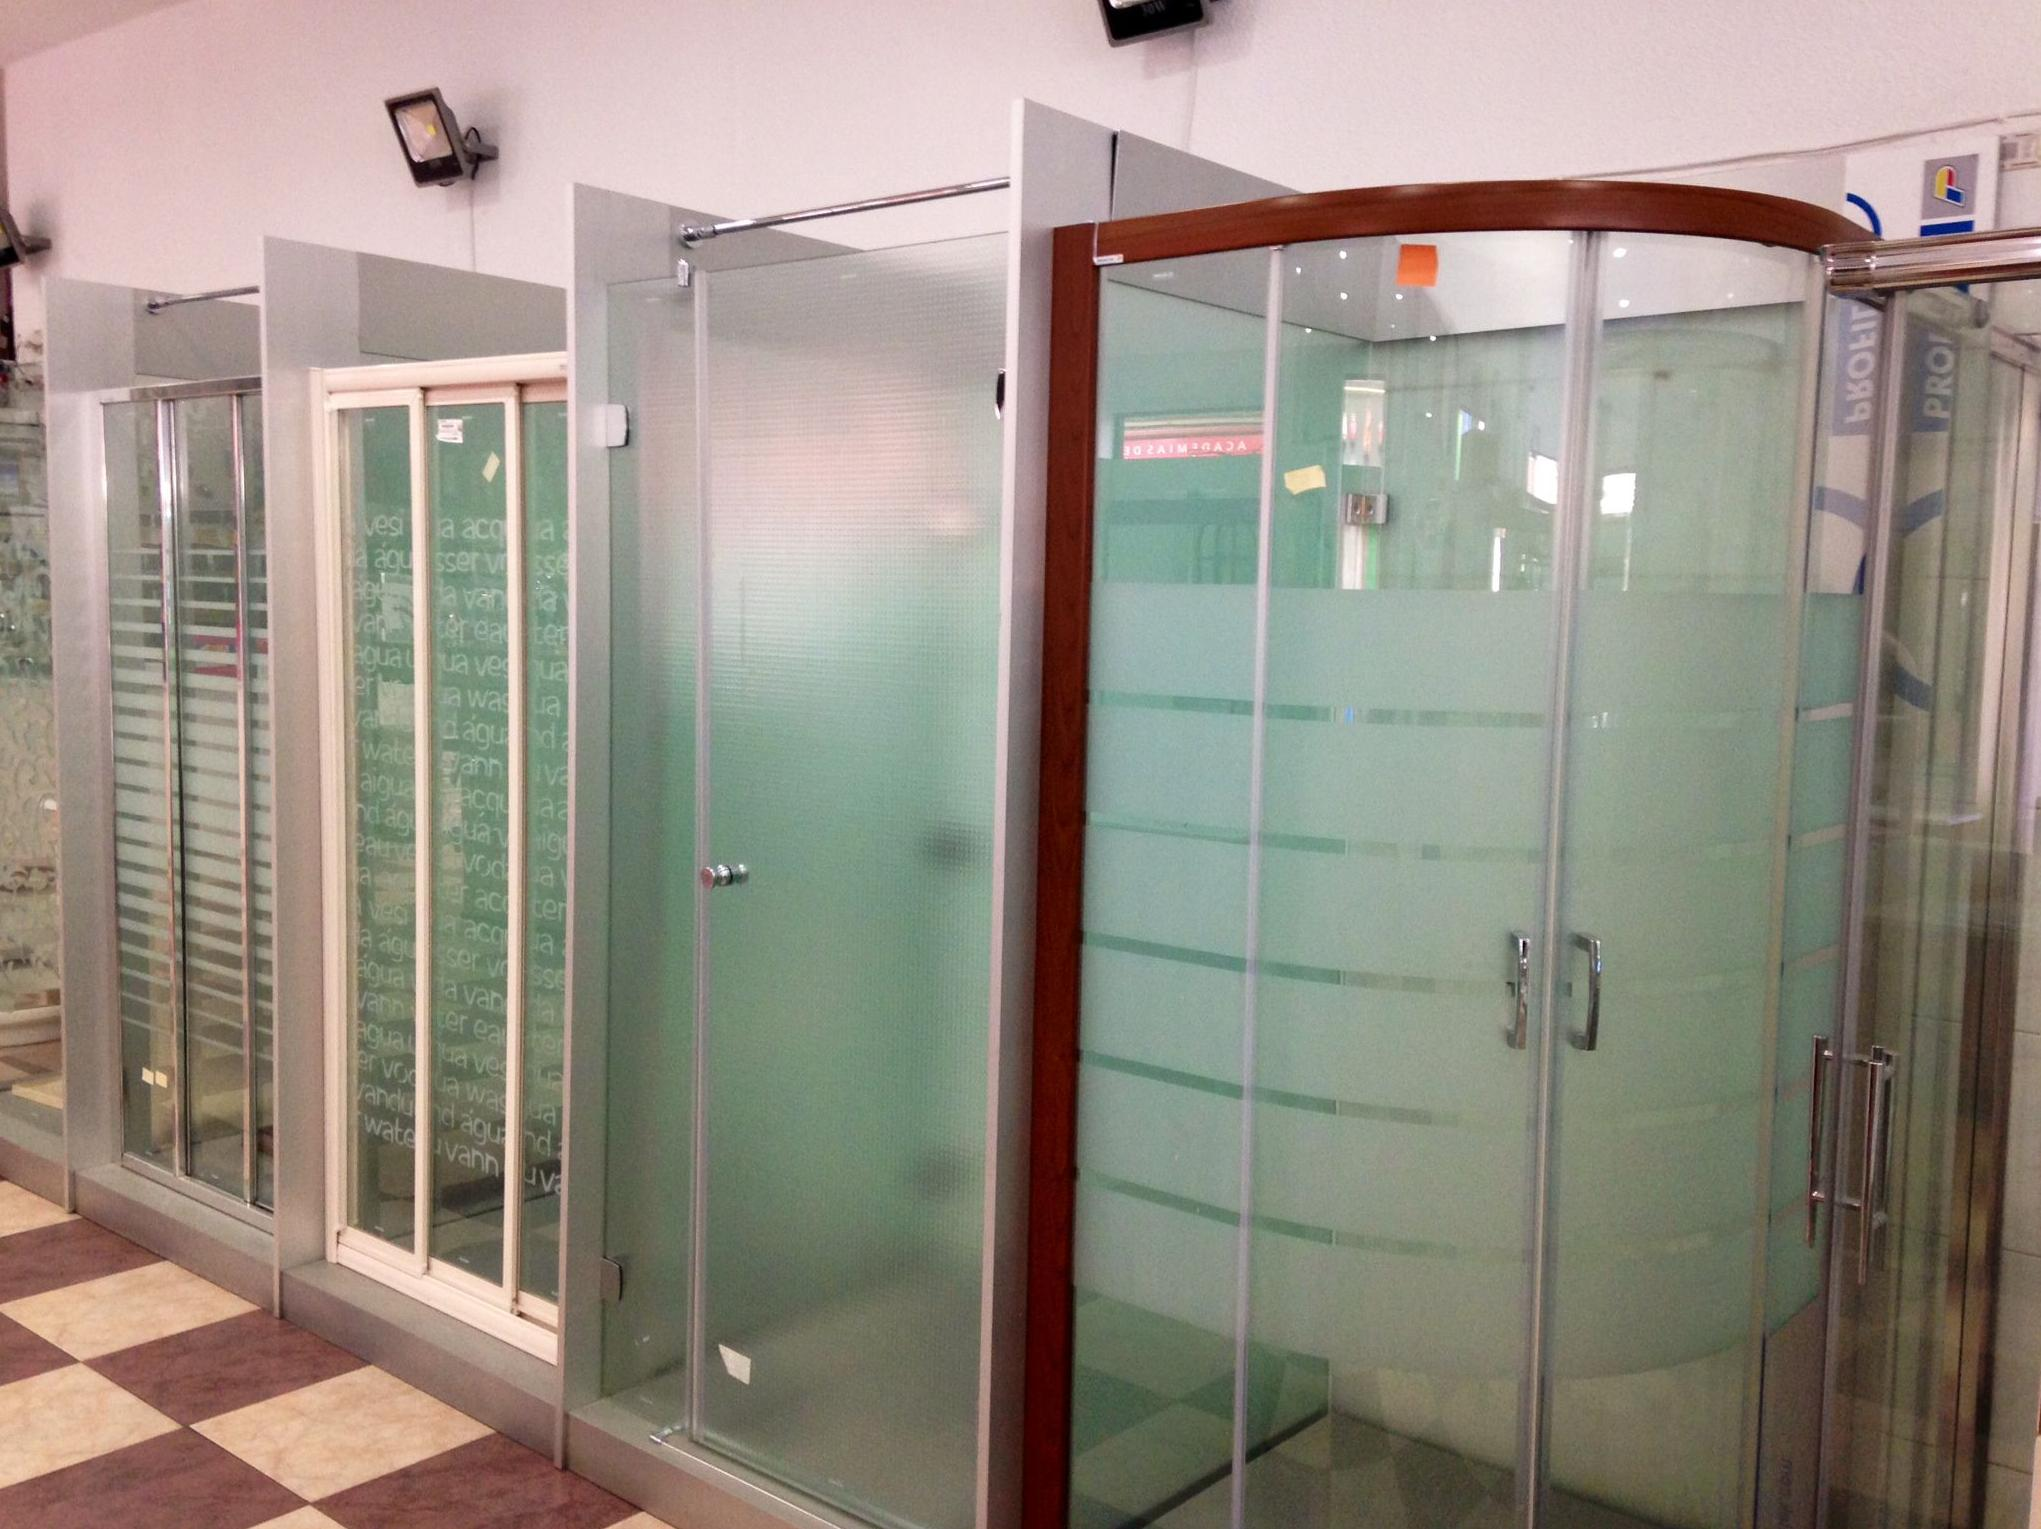 Exposición de mámparas de baño